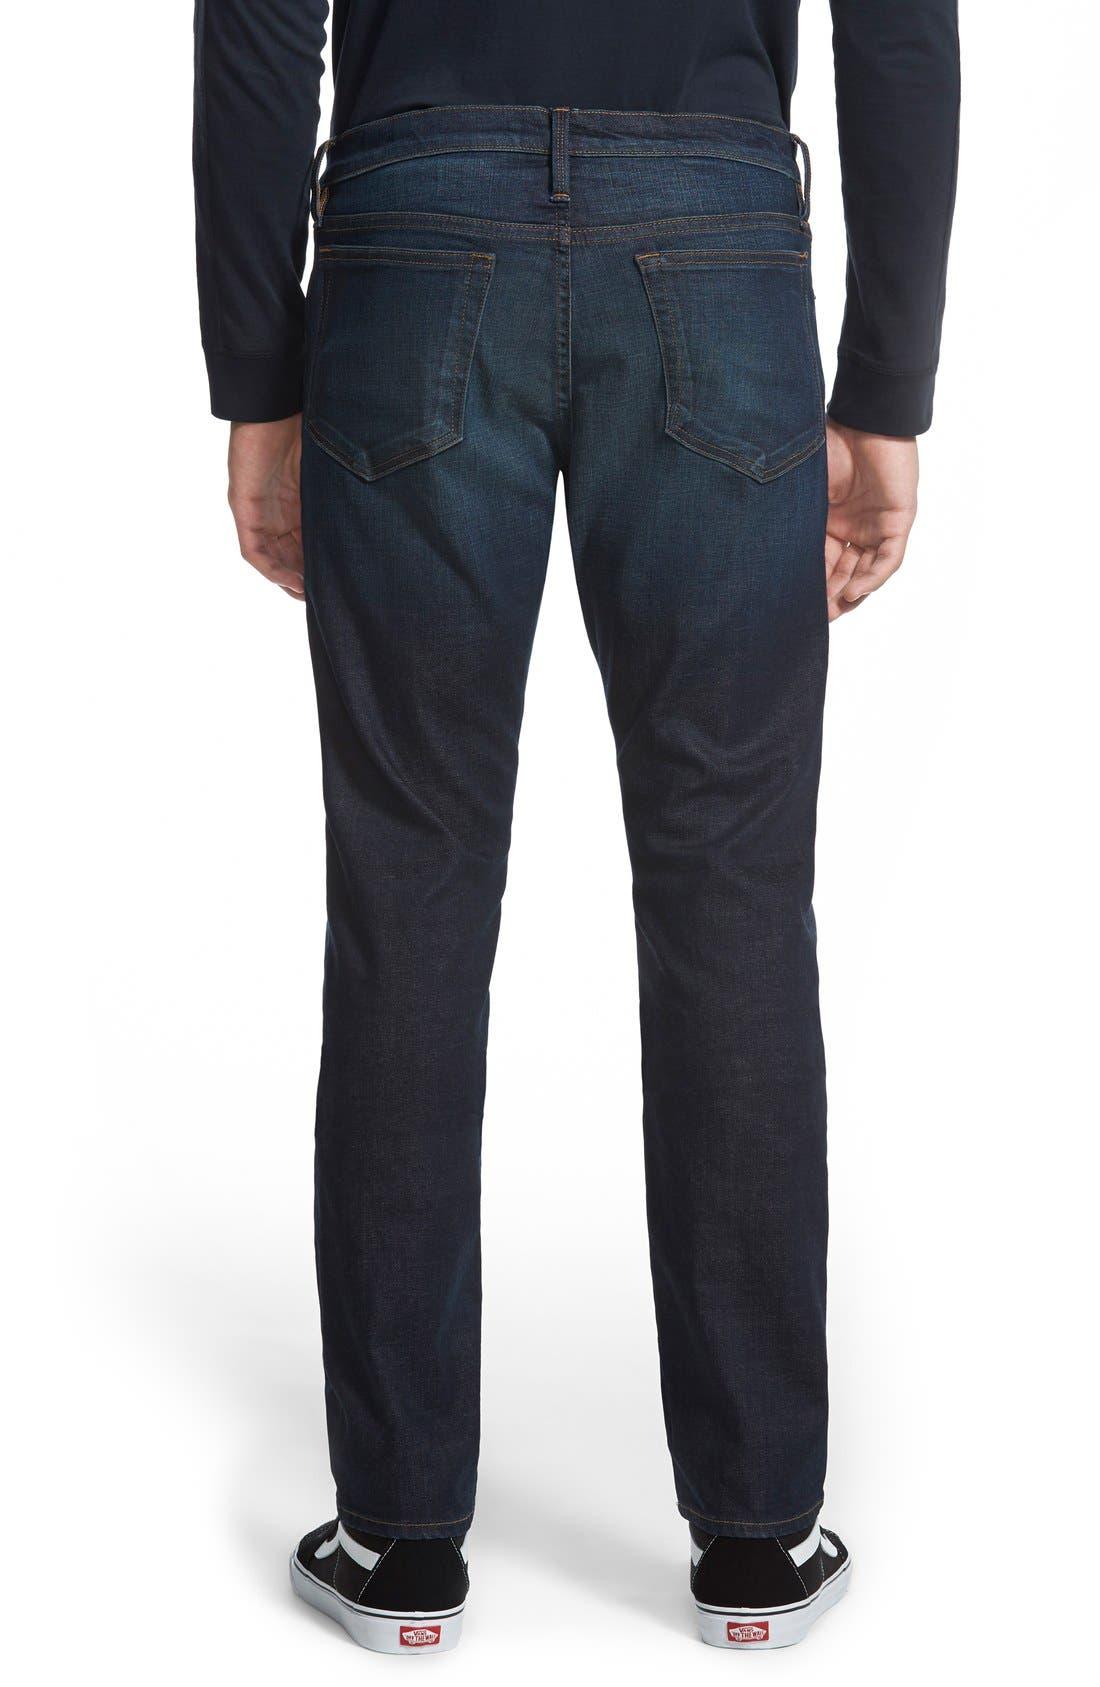 L'Homme Skinny Fit Jeans,                             Alternate thumbnail 2, color,                             Sierra